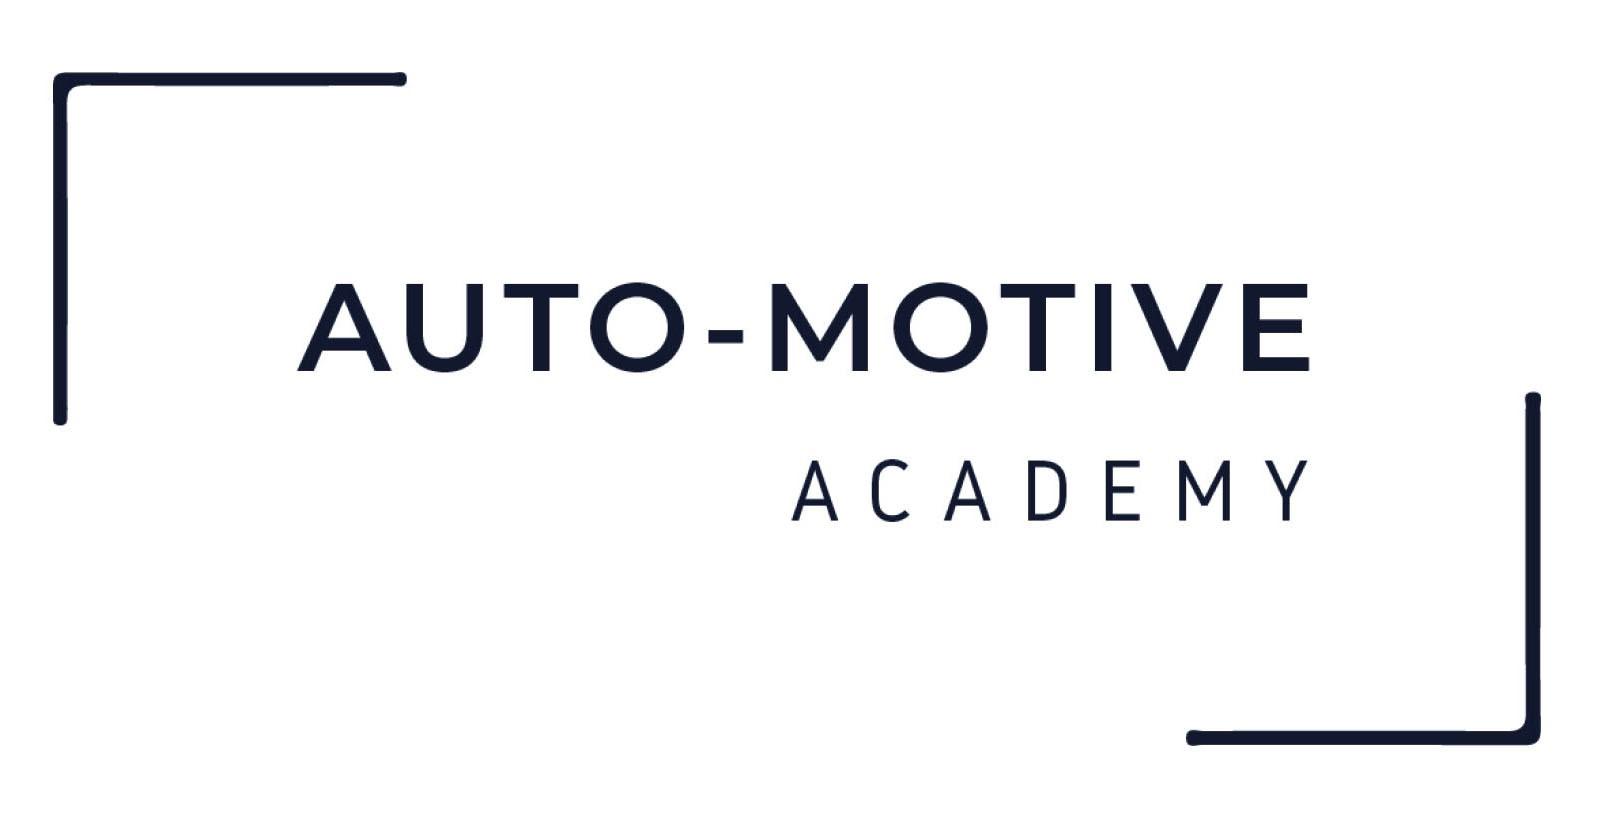 Auto-Motive Academy